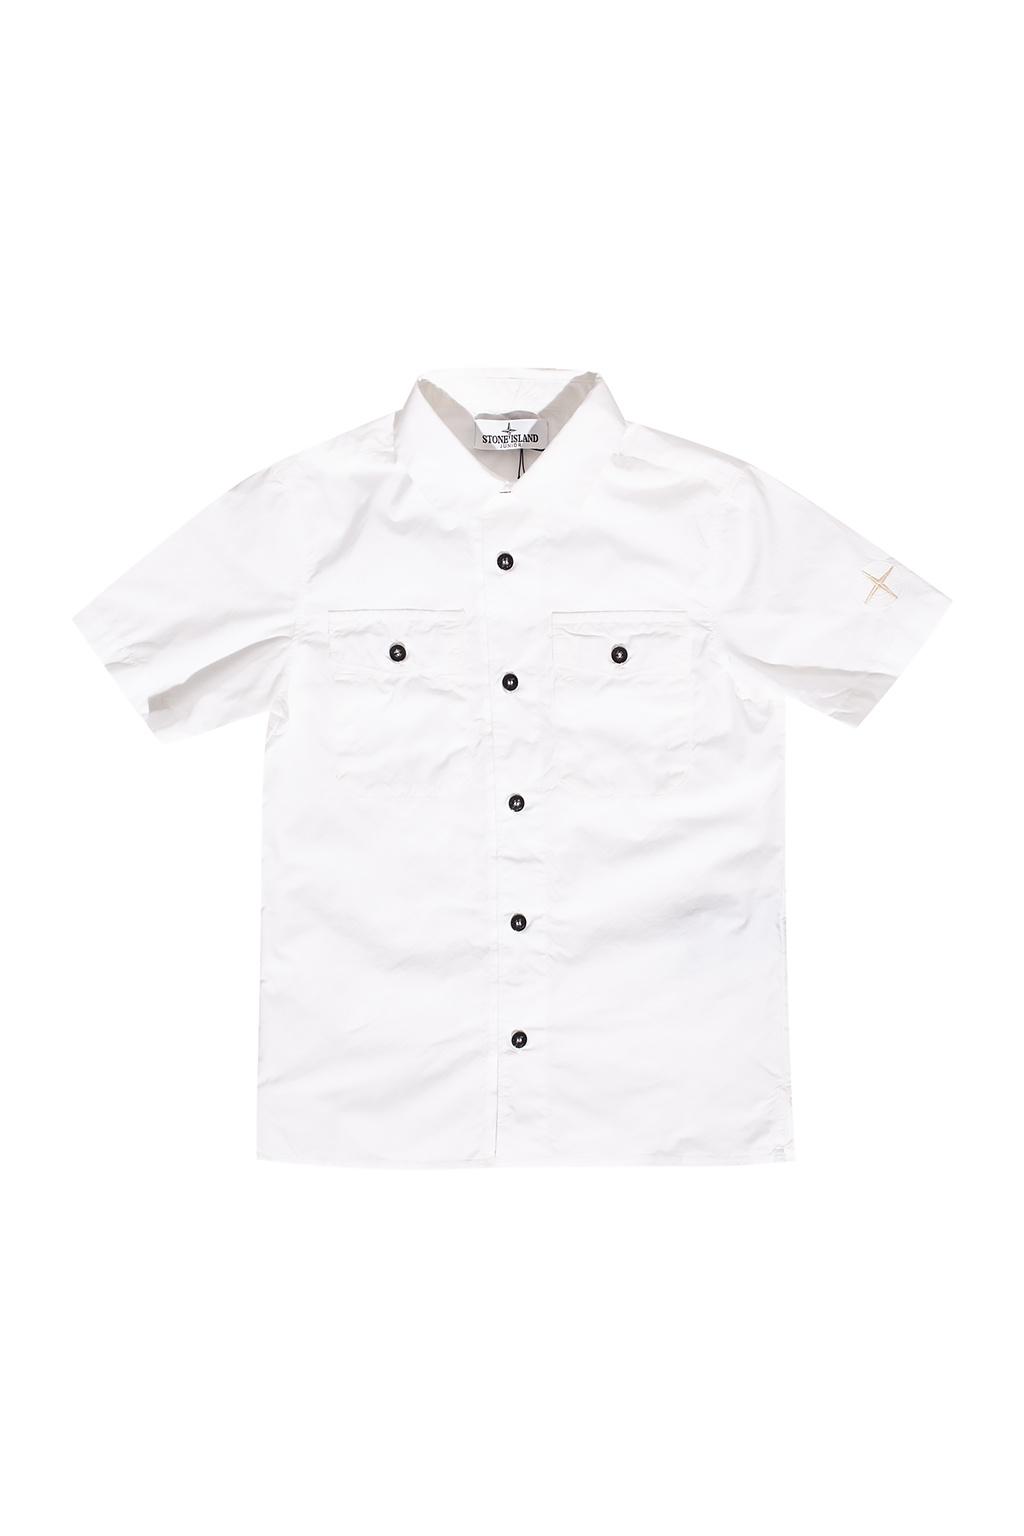 Stone Island Kids Short sleeve shirt